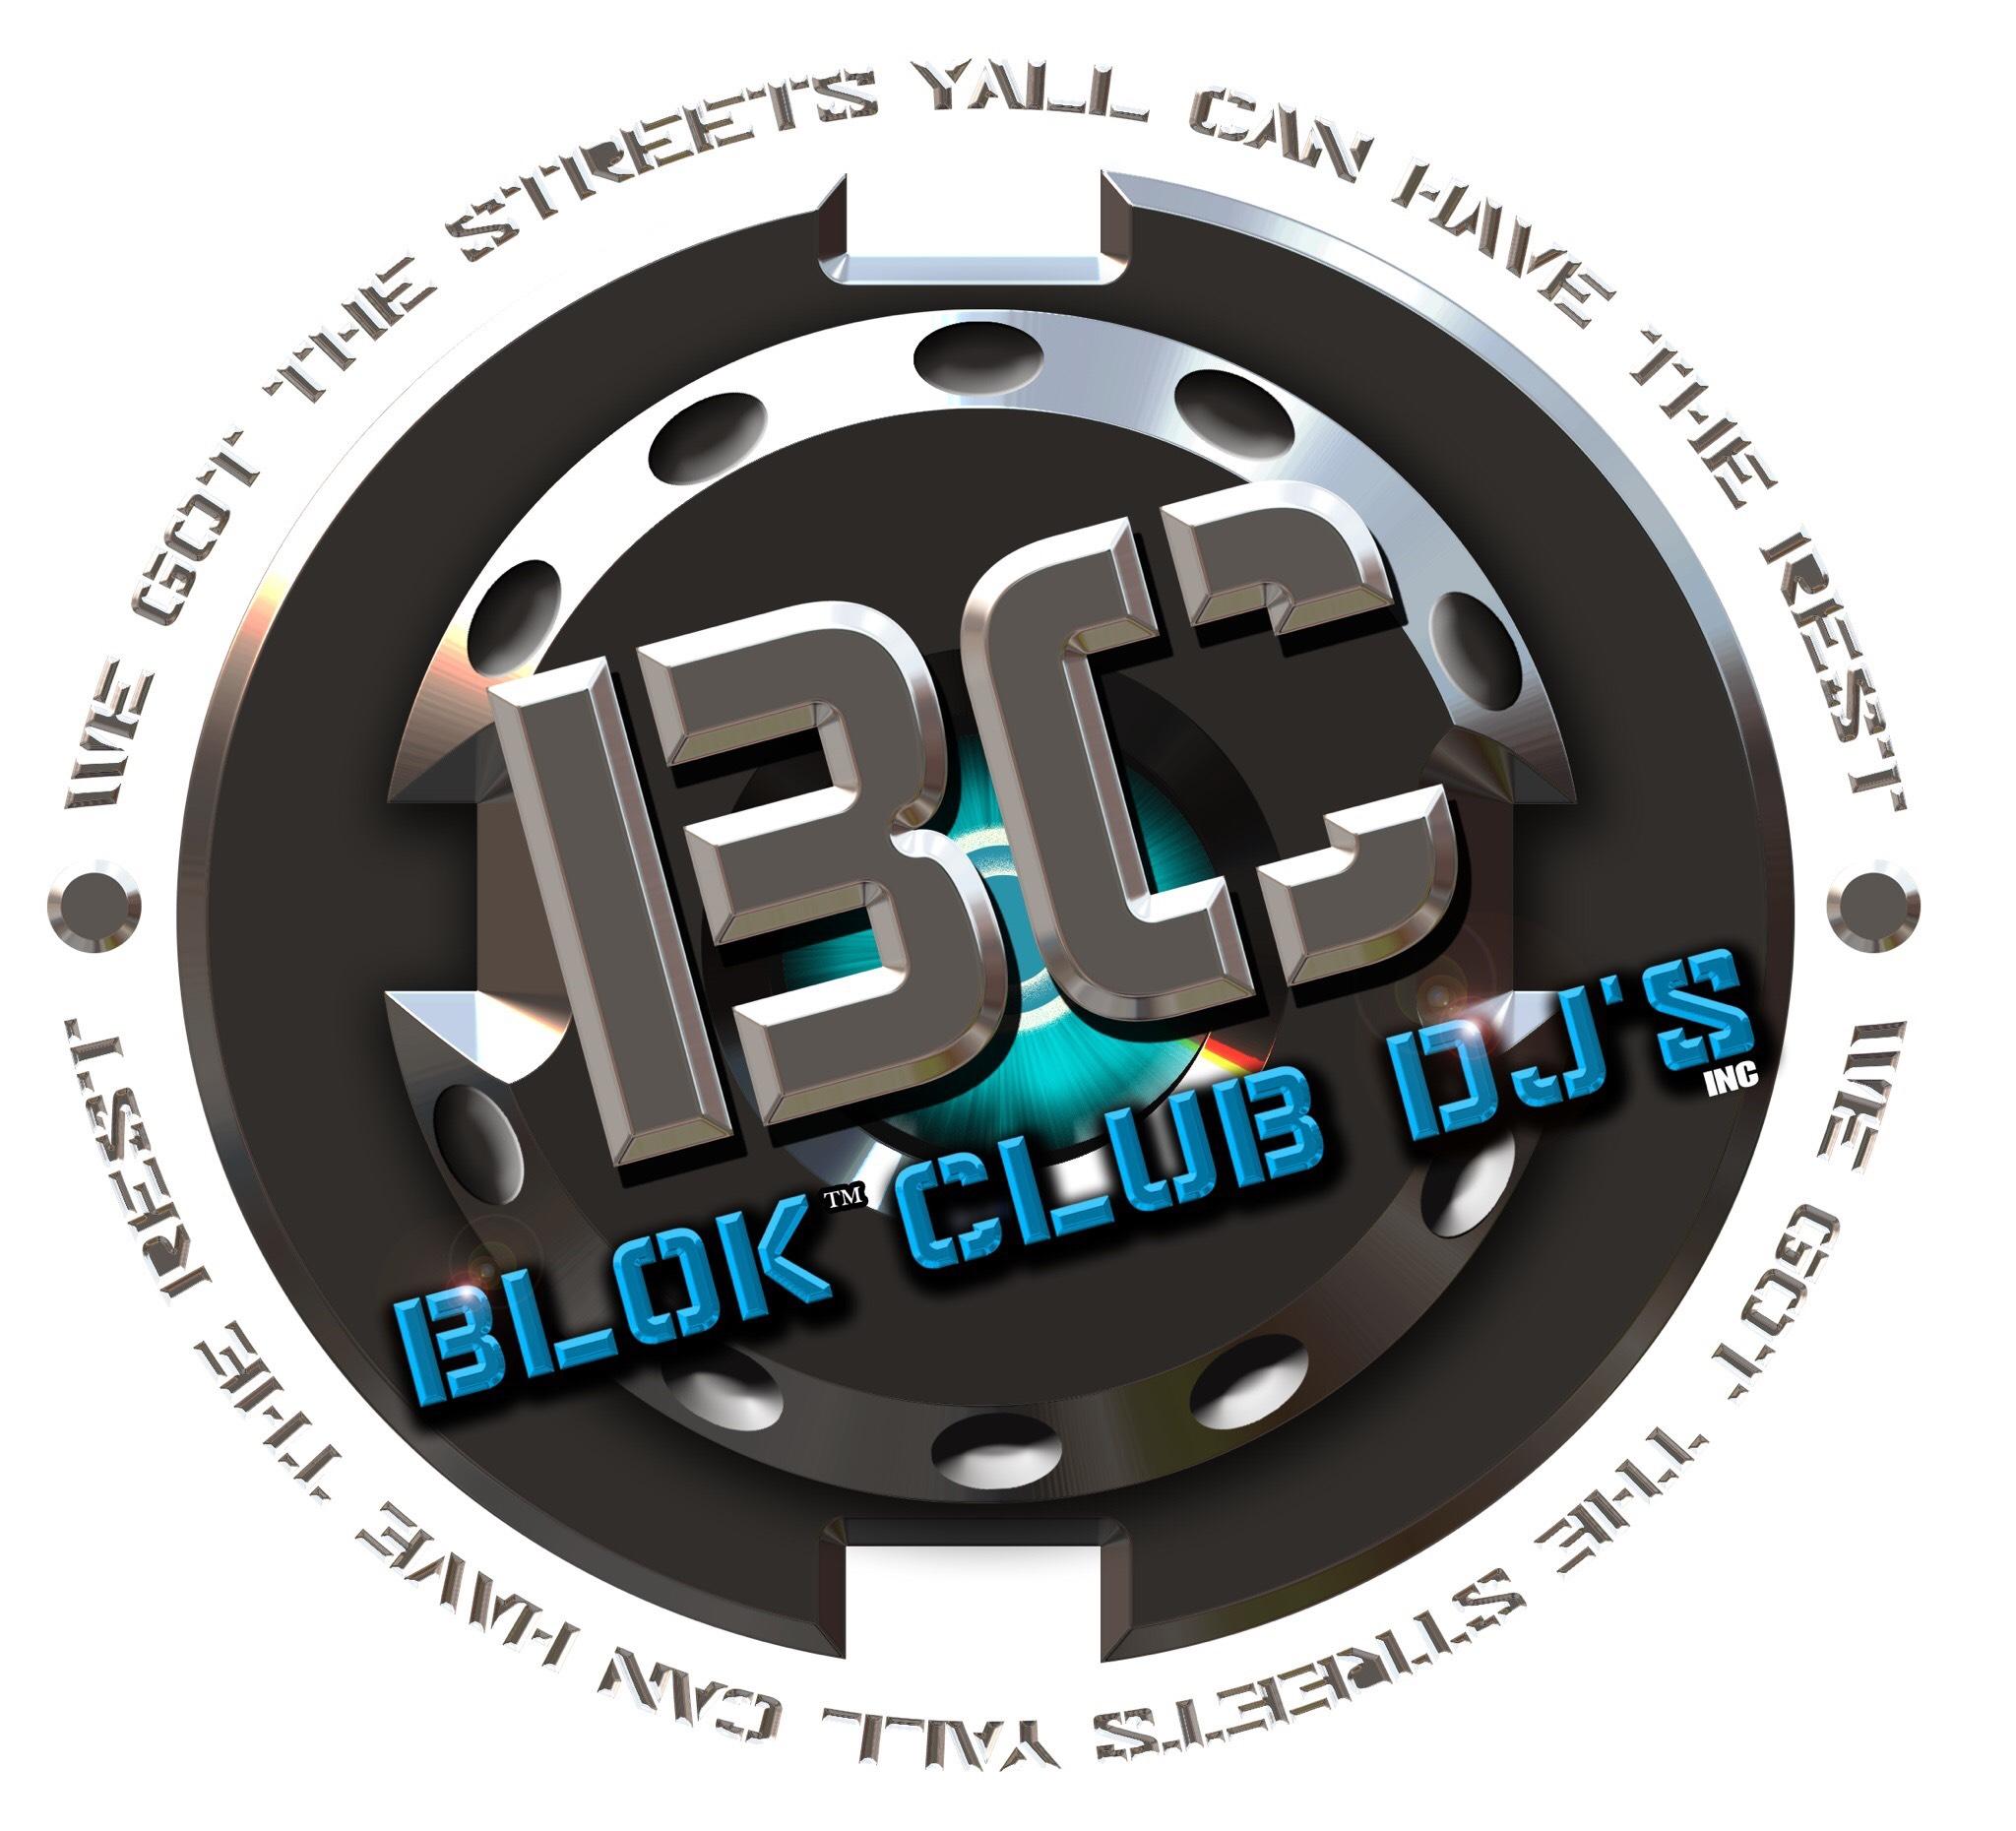 Blok Club DJ's Inc